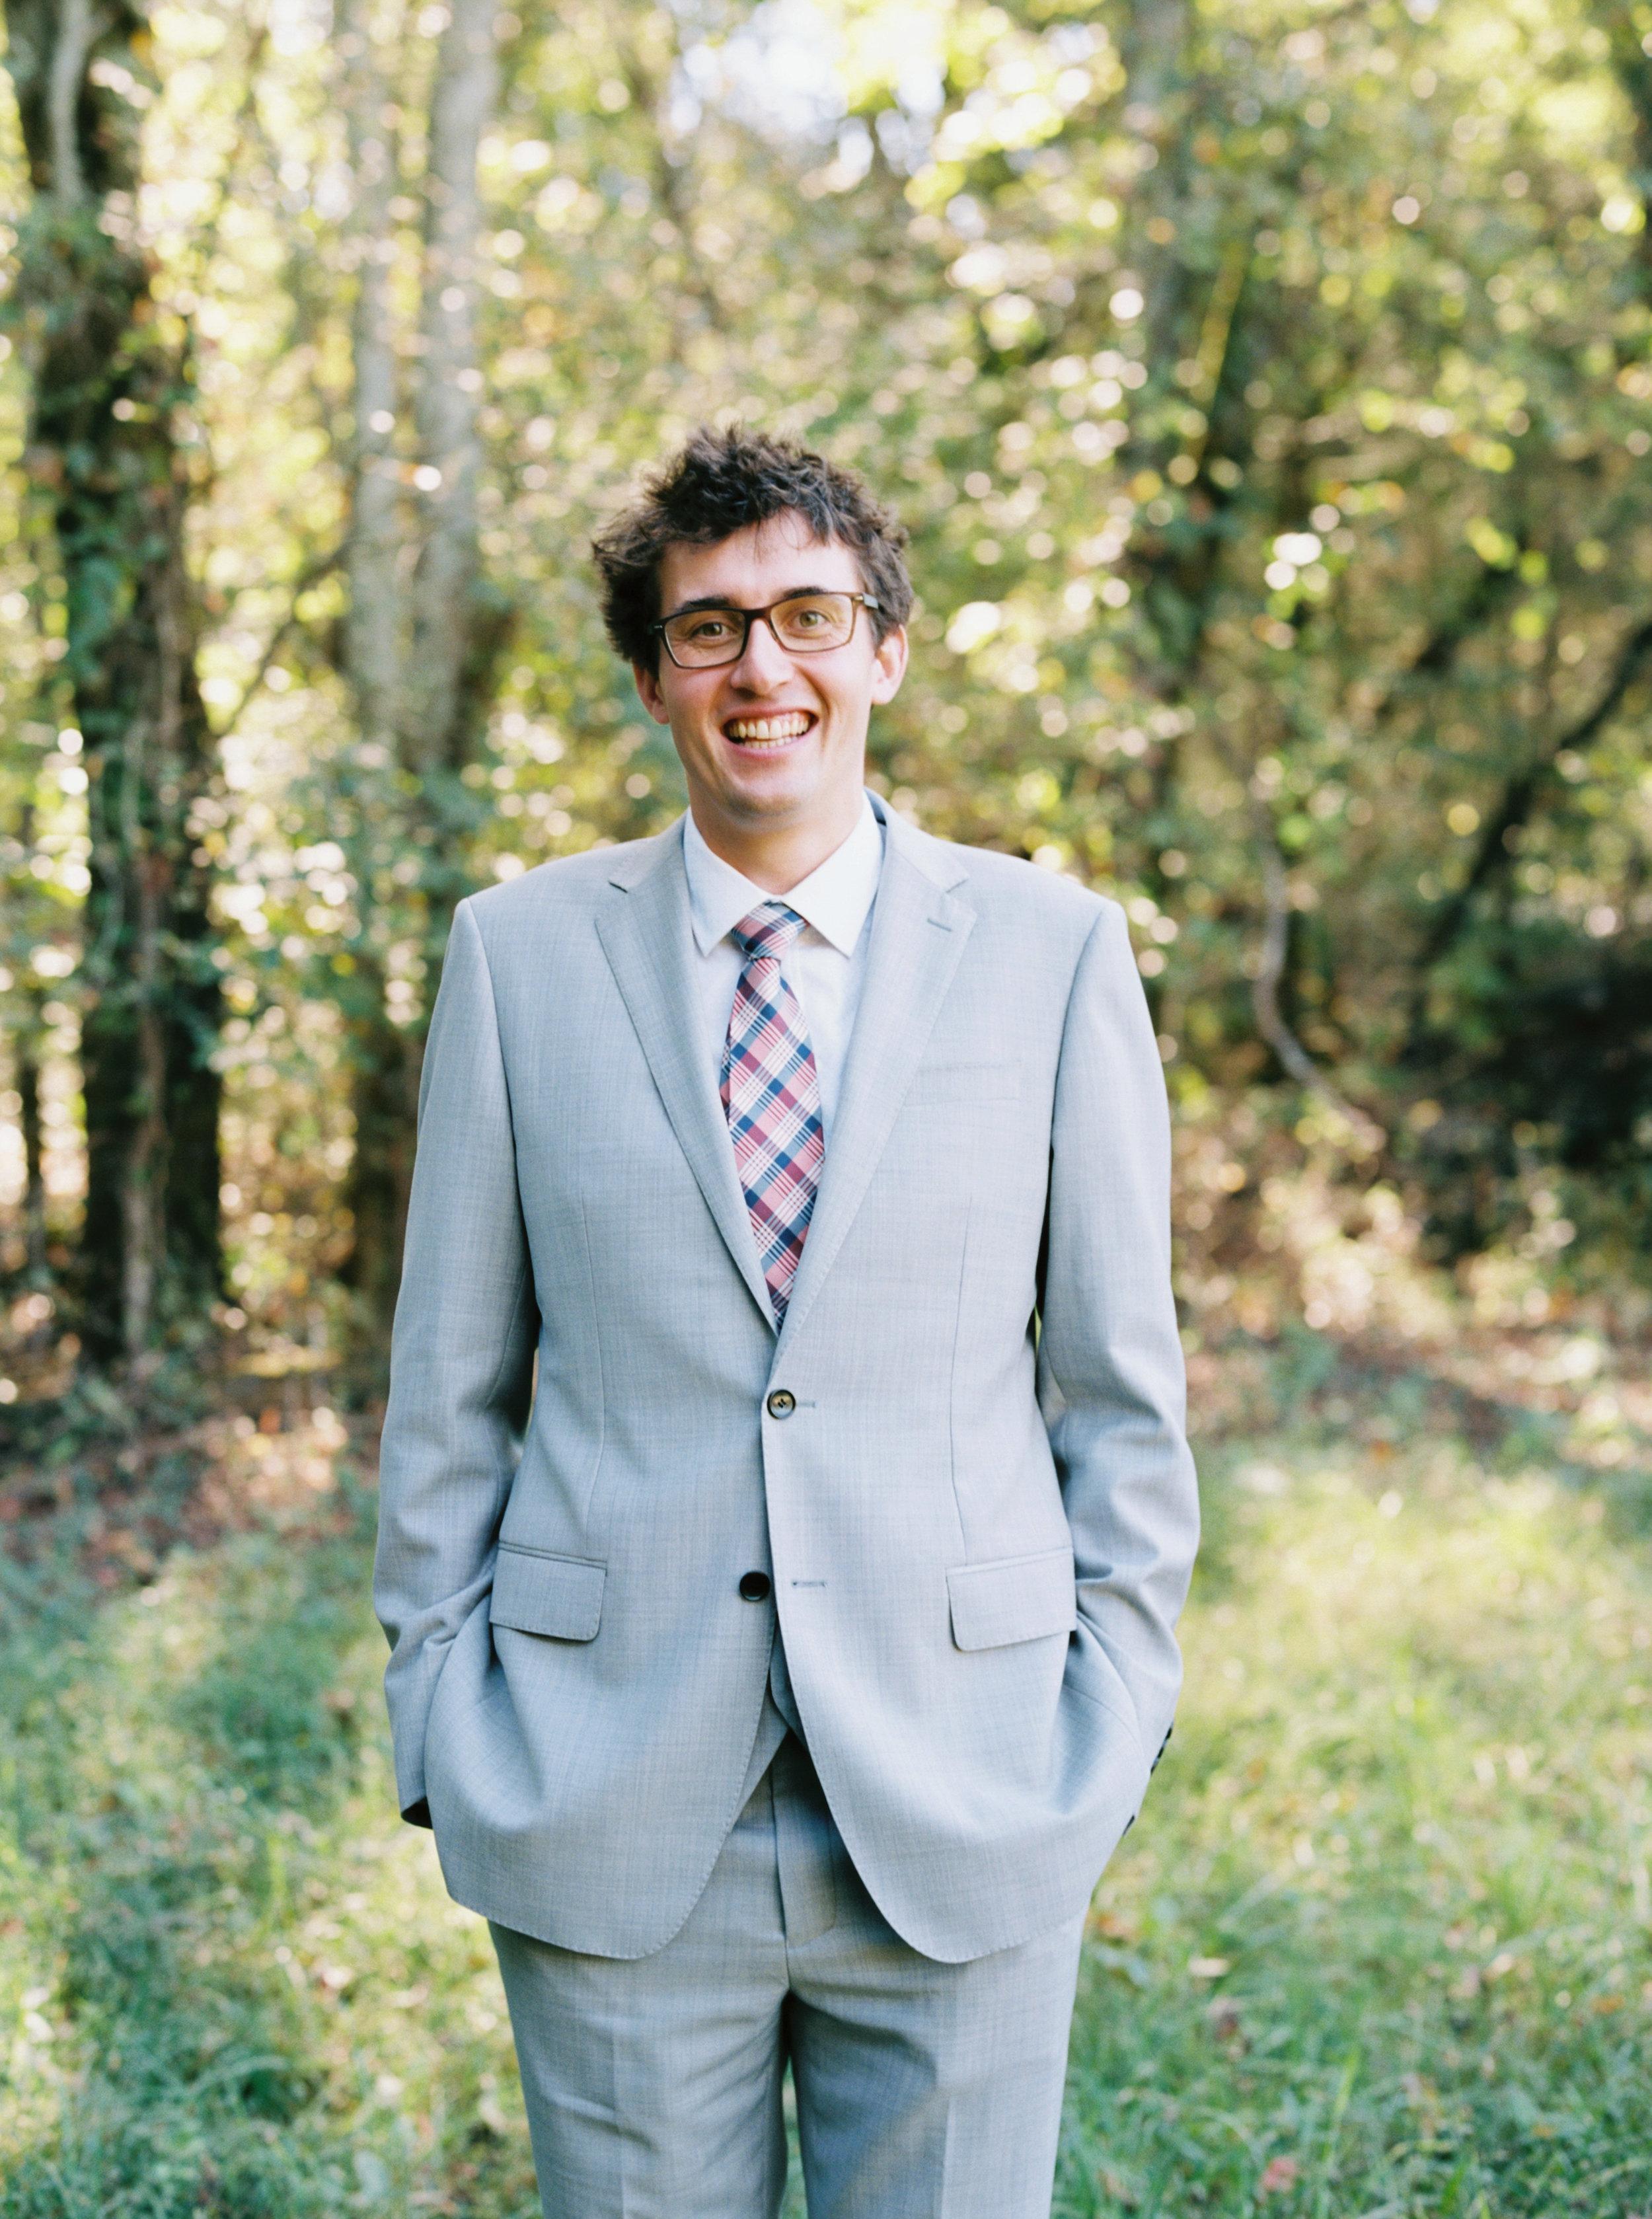 Bloomsbury Farm Fall Wedding - Nashville, TN